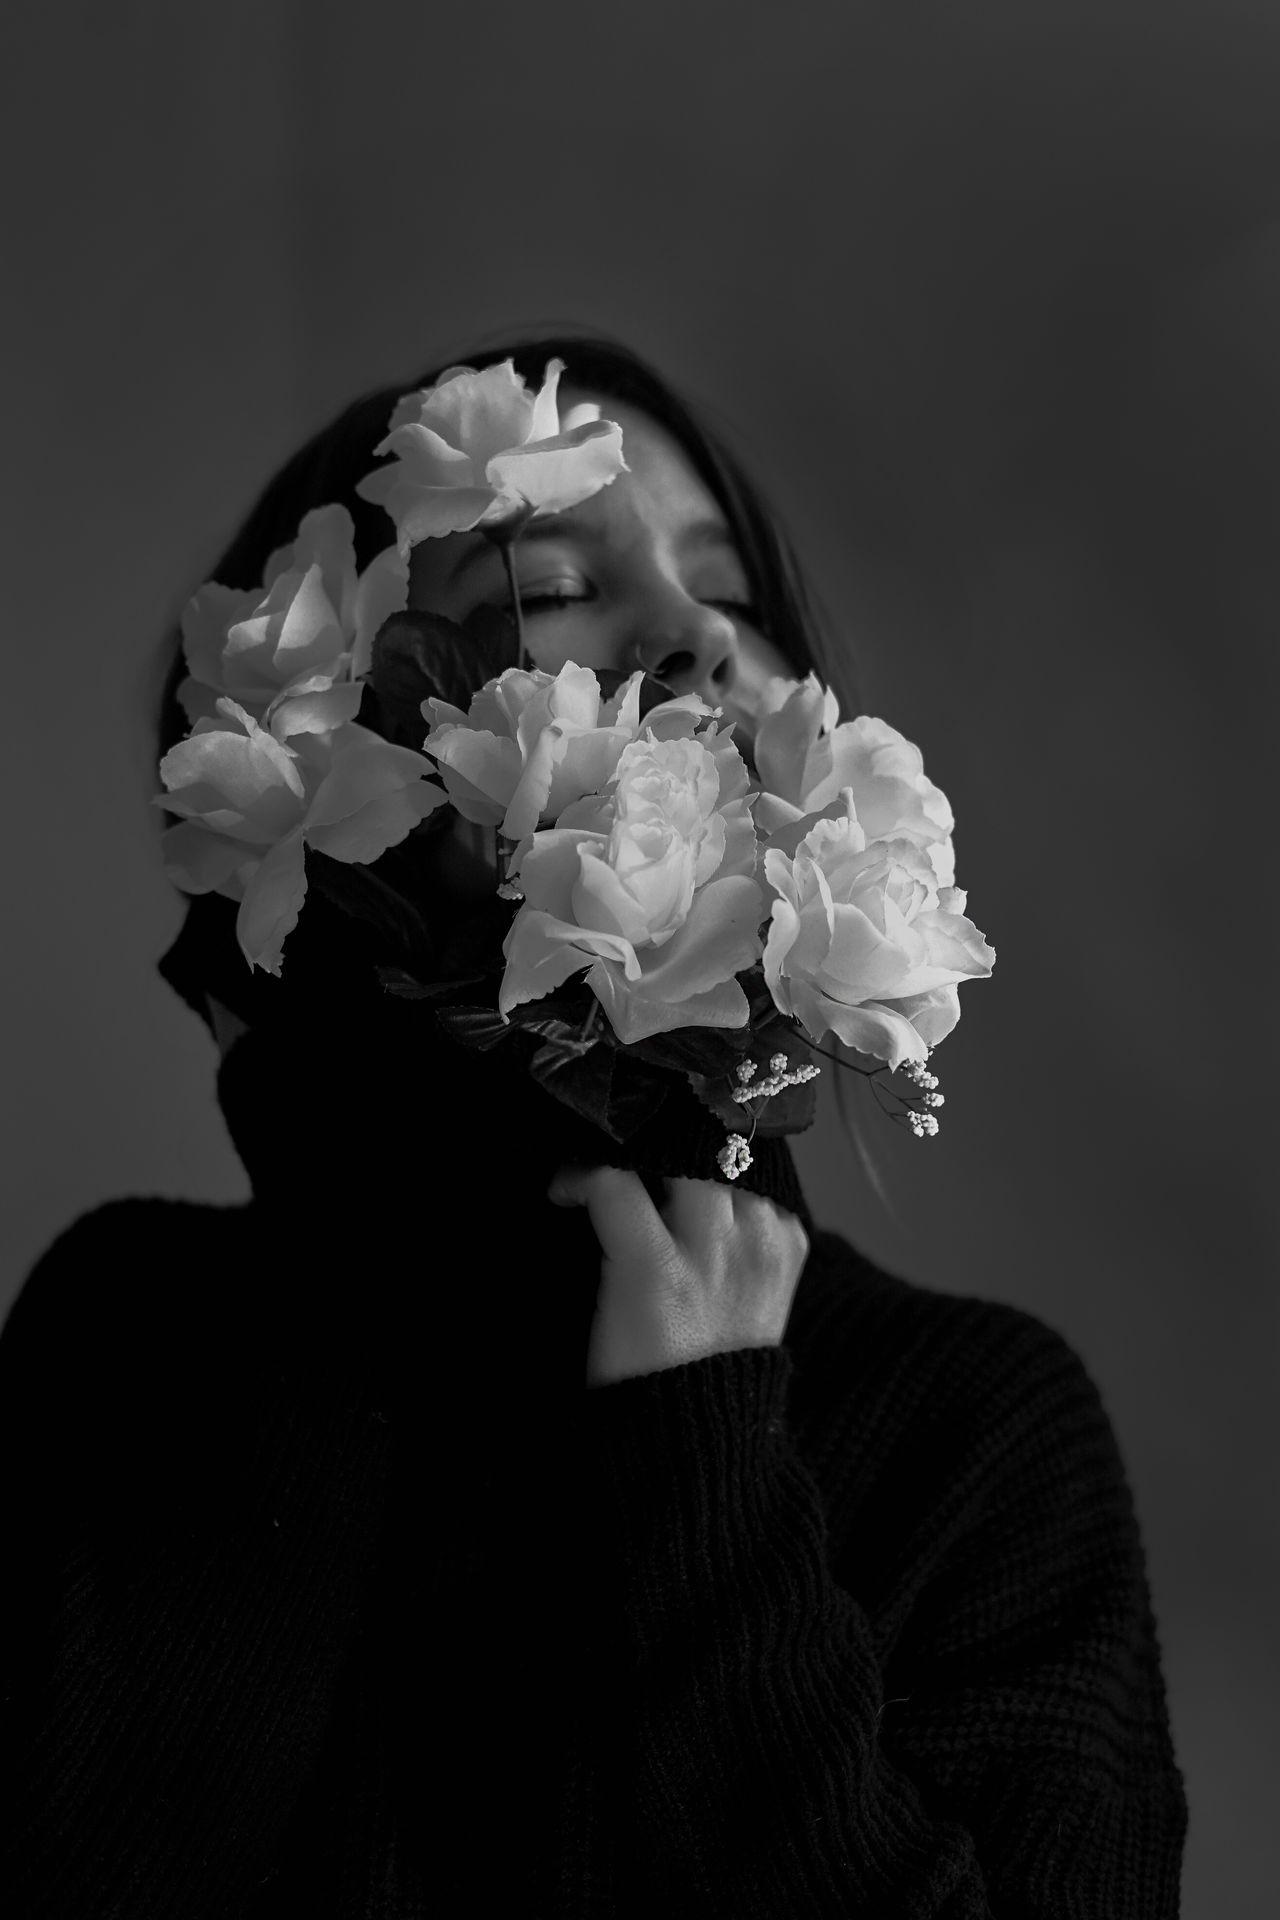 flower, flowering plant, plant, headshot, one person